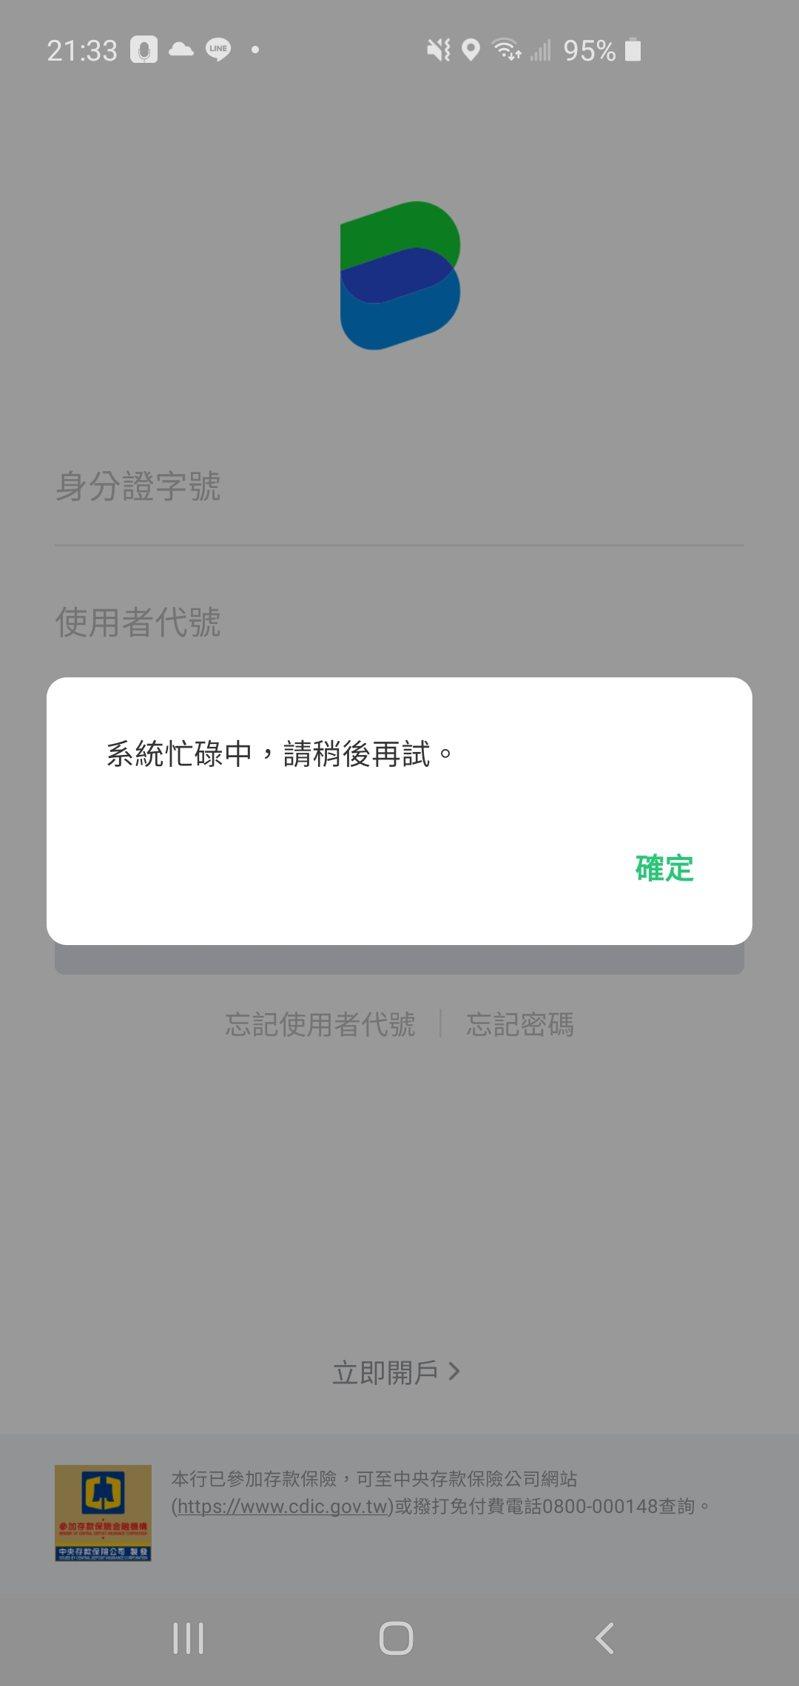 LINE Bank今晚再傳災情,系統過載App無法開啟。 圖/網友提供